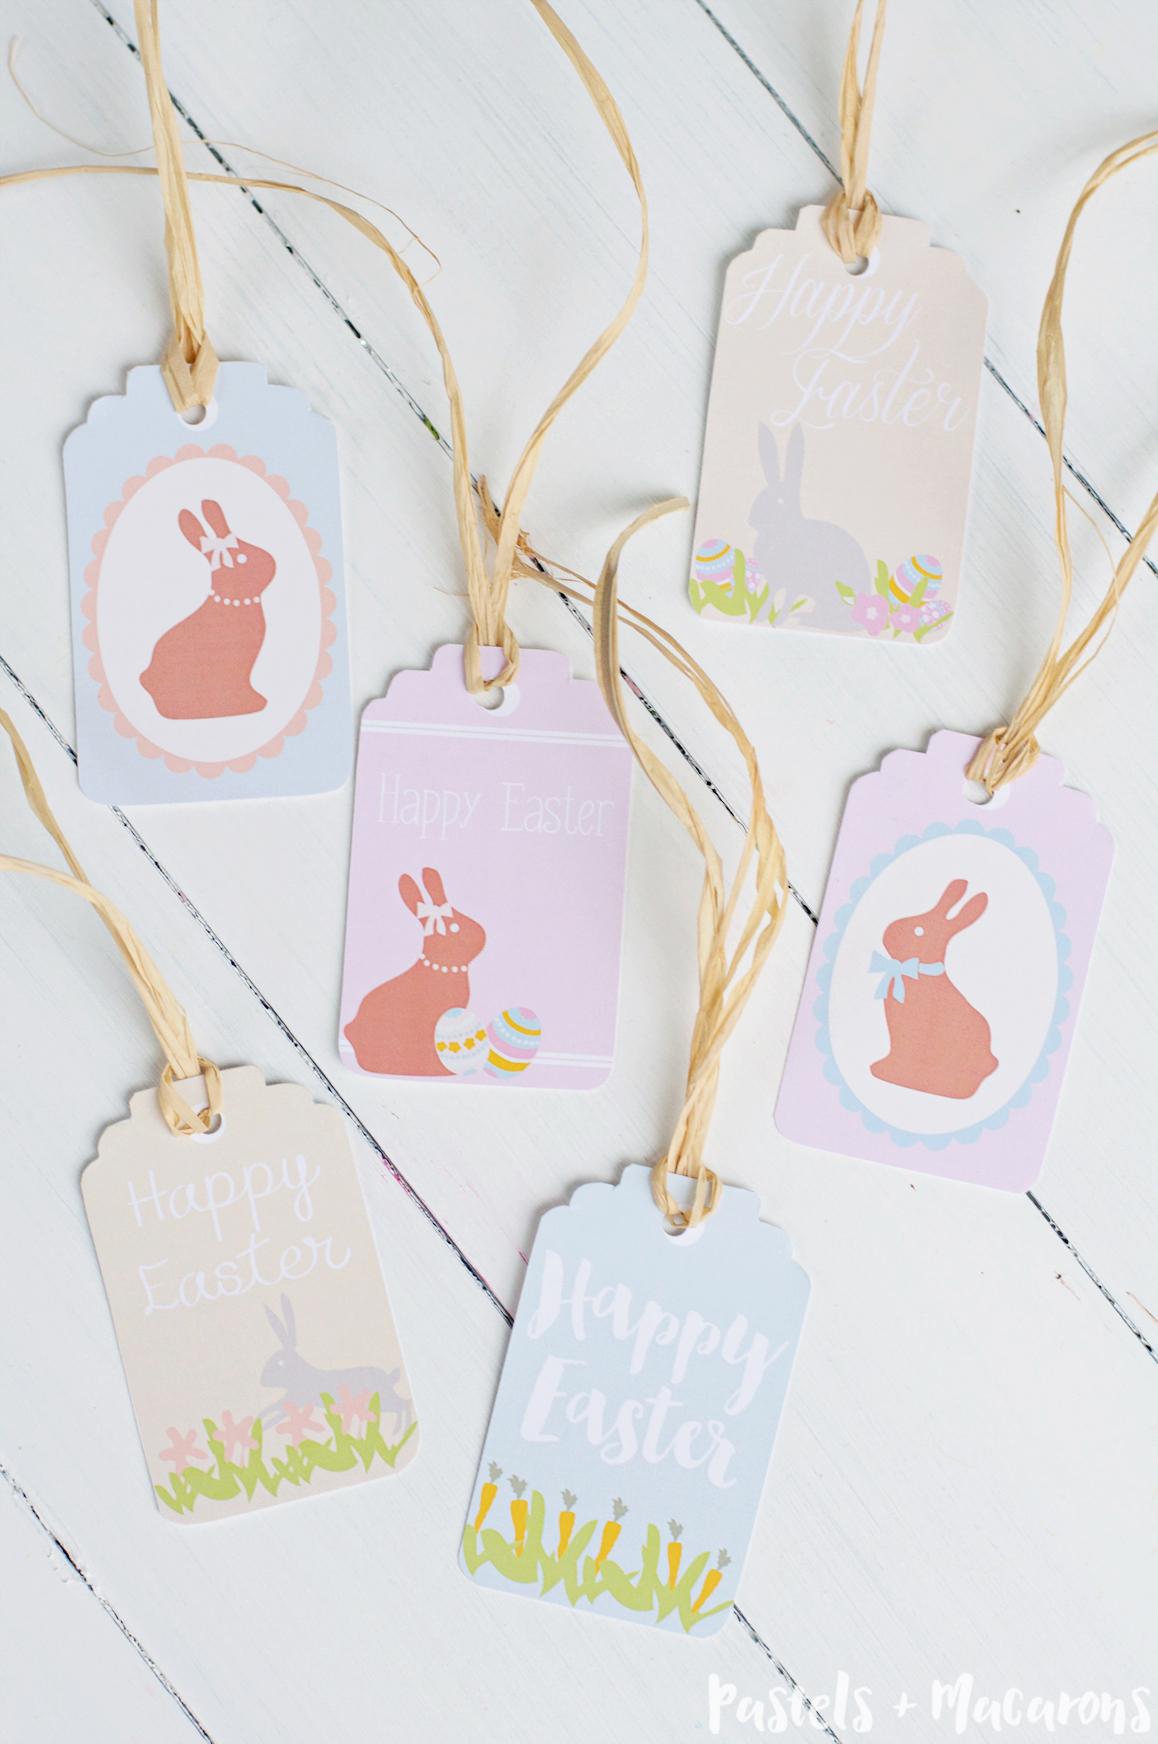 Free Printable Easter Gift Tags - Free Printable Easter Tags